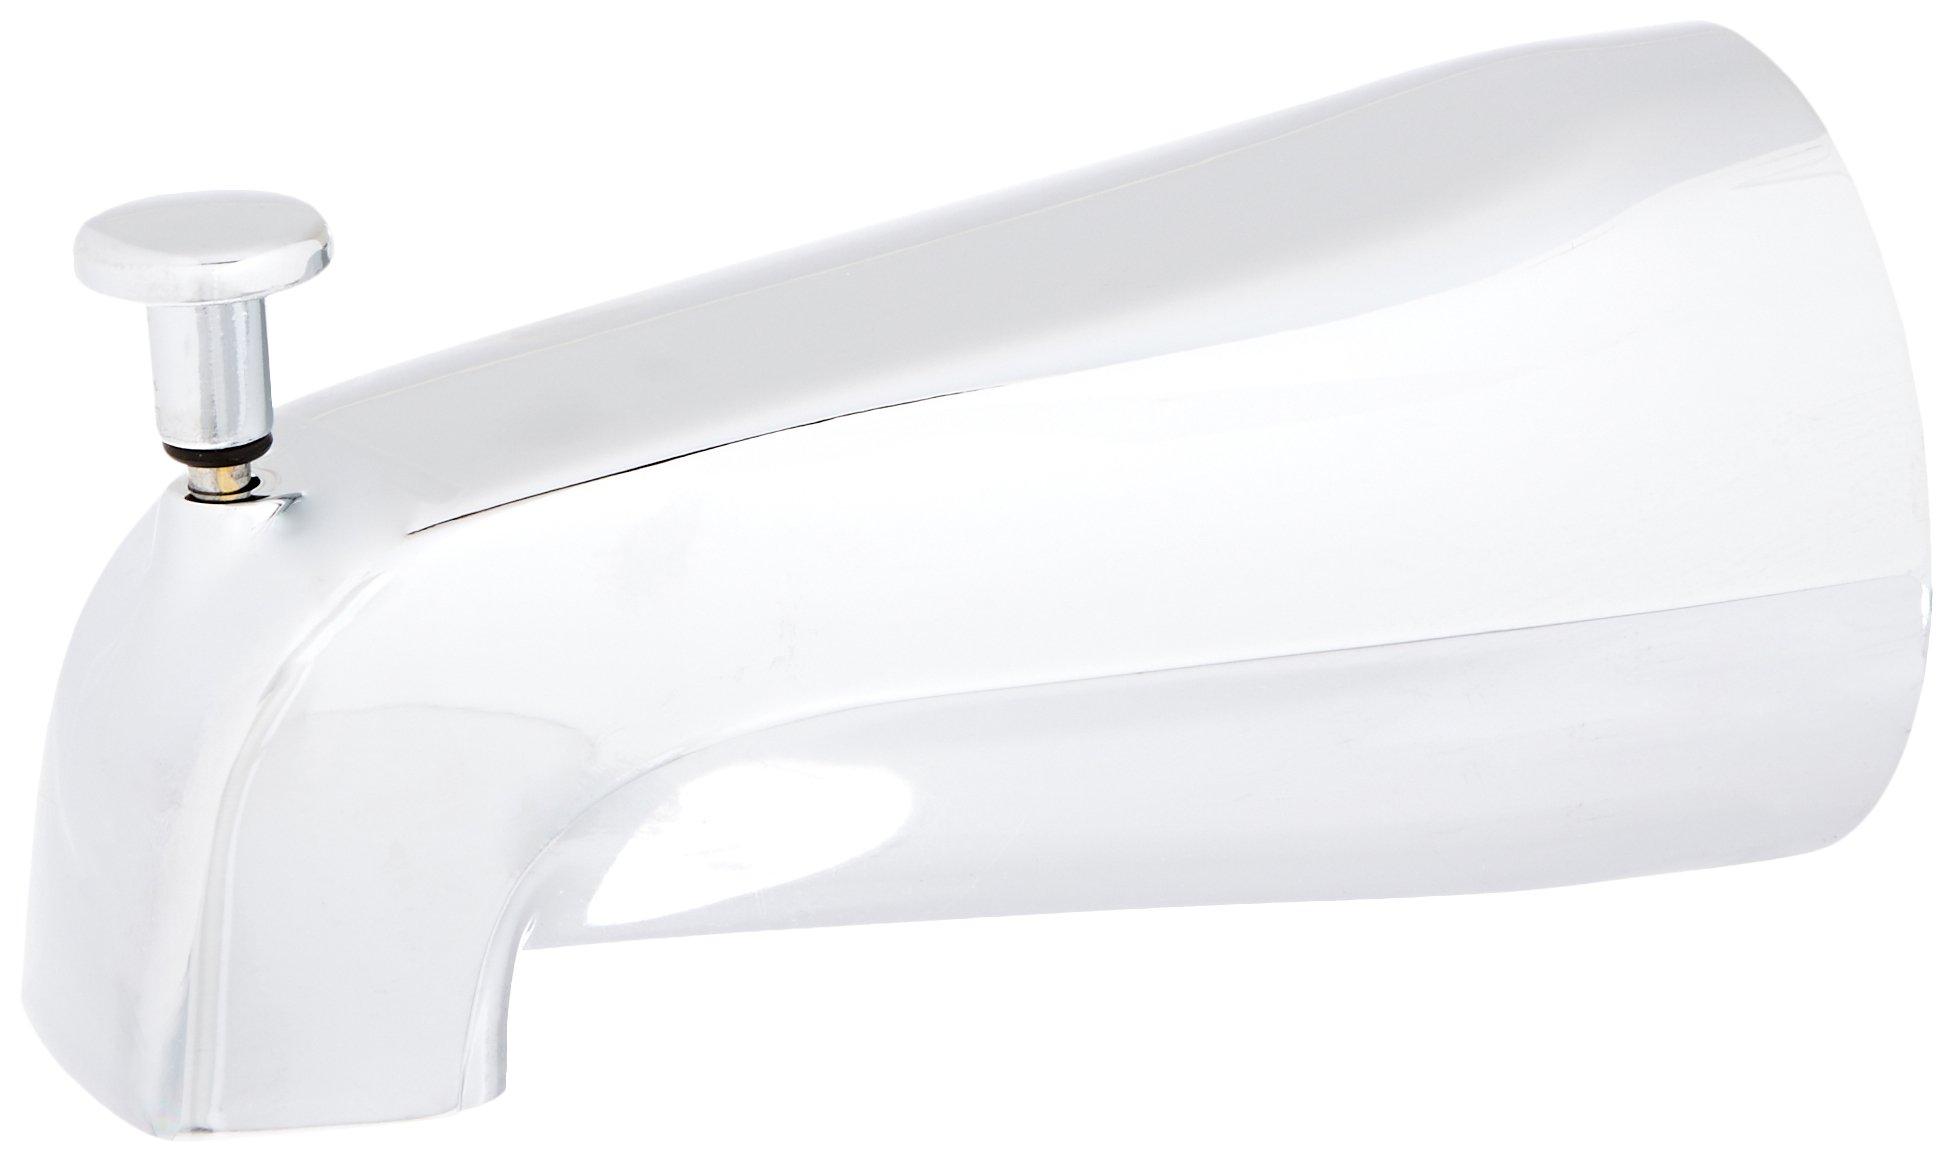 EZ-FLO 15089 Slide-On Diverter Spout